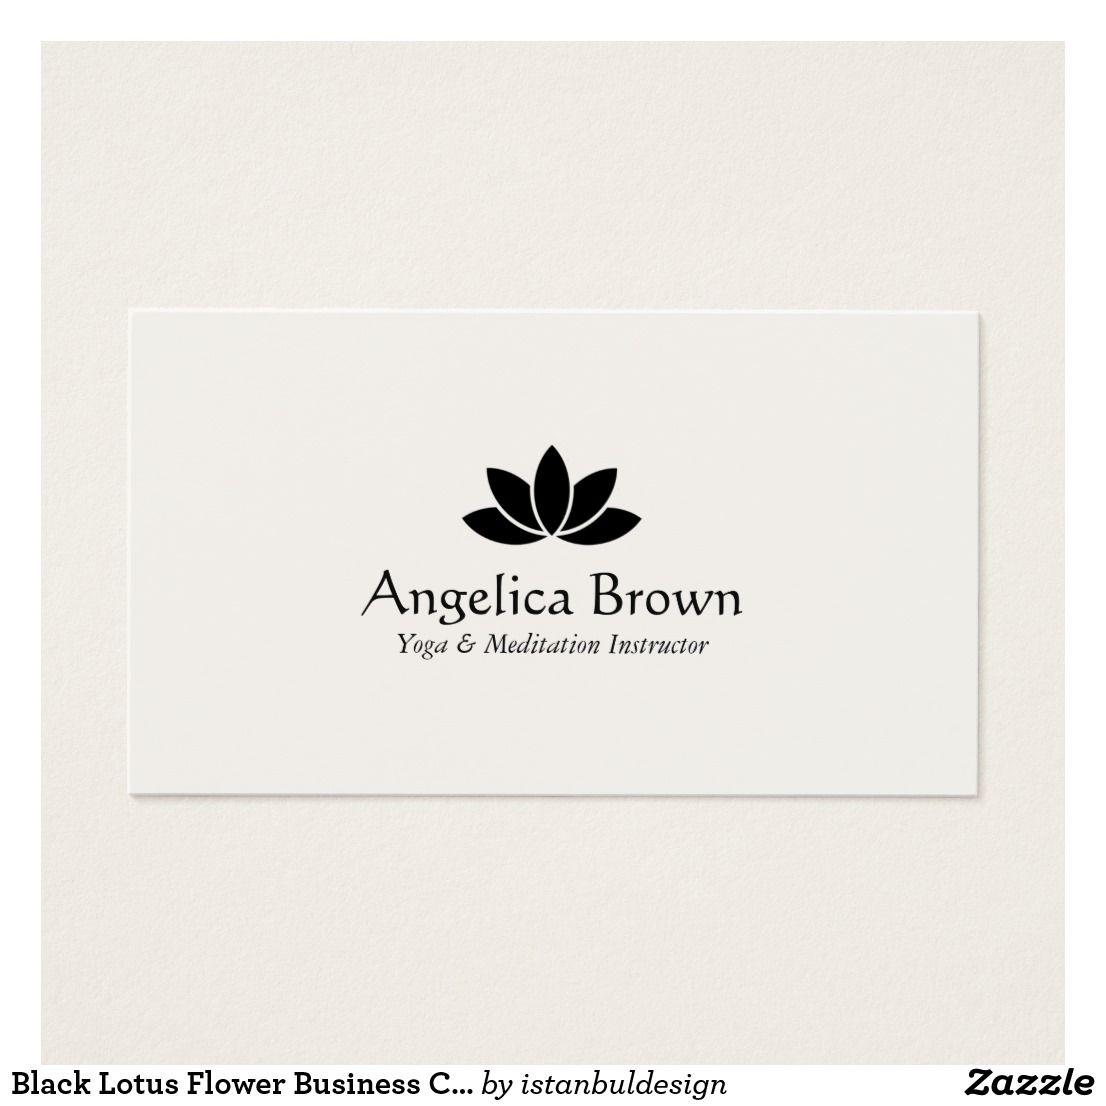 Black Lotus Flower Business Card | Business cards